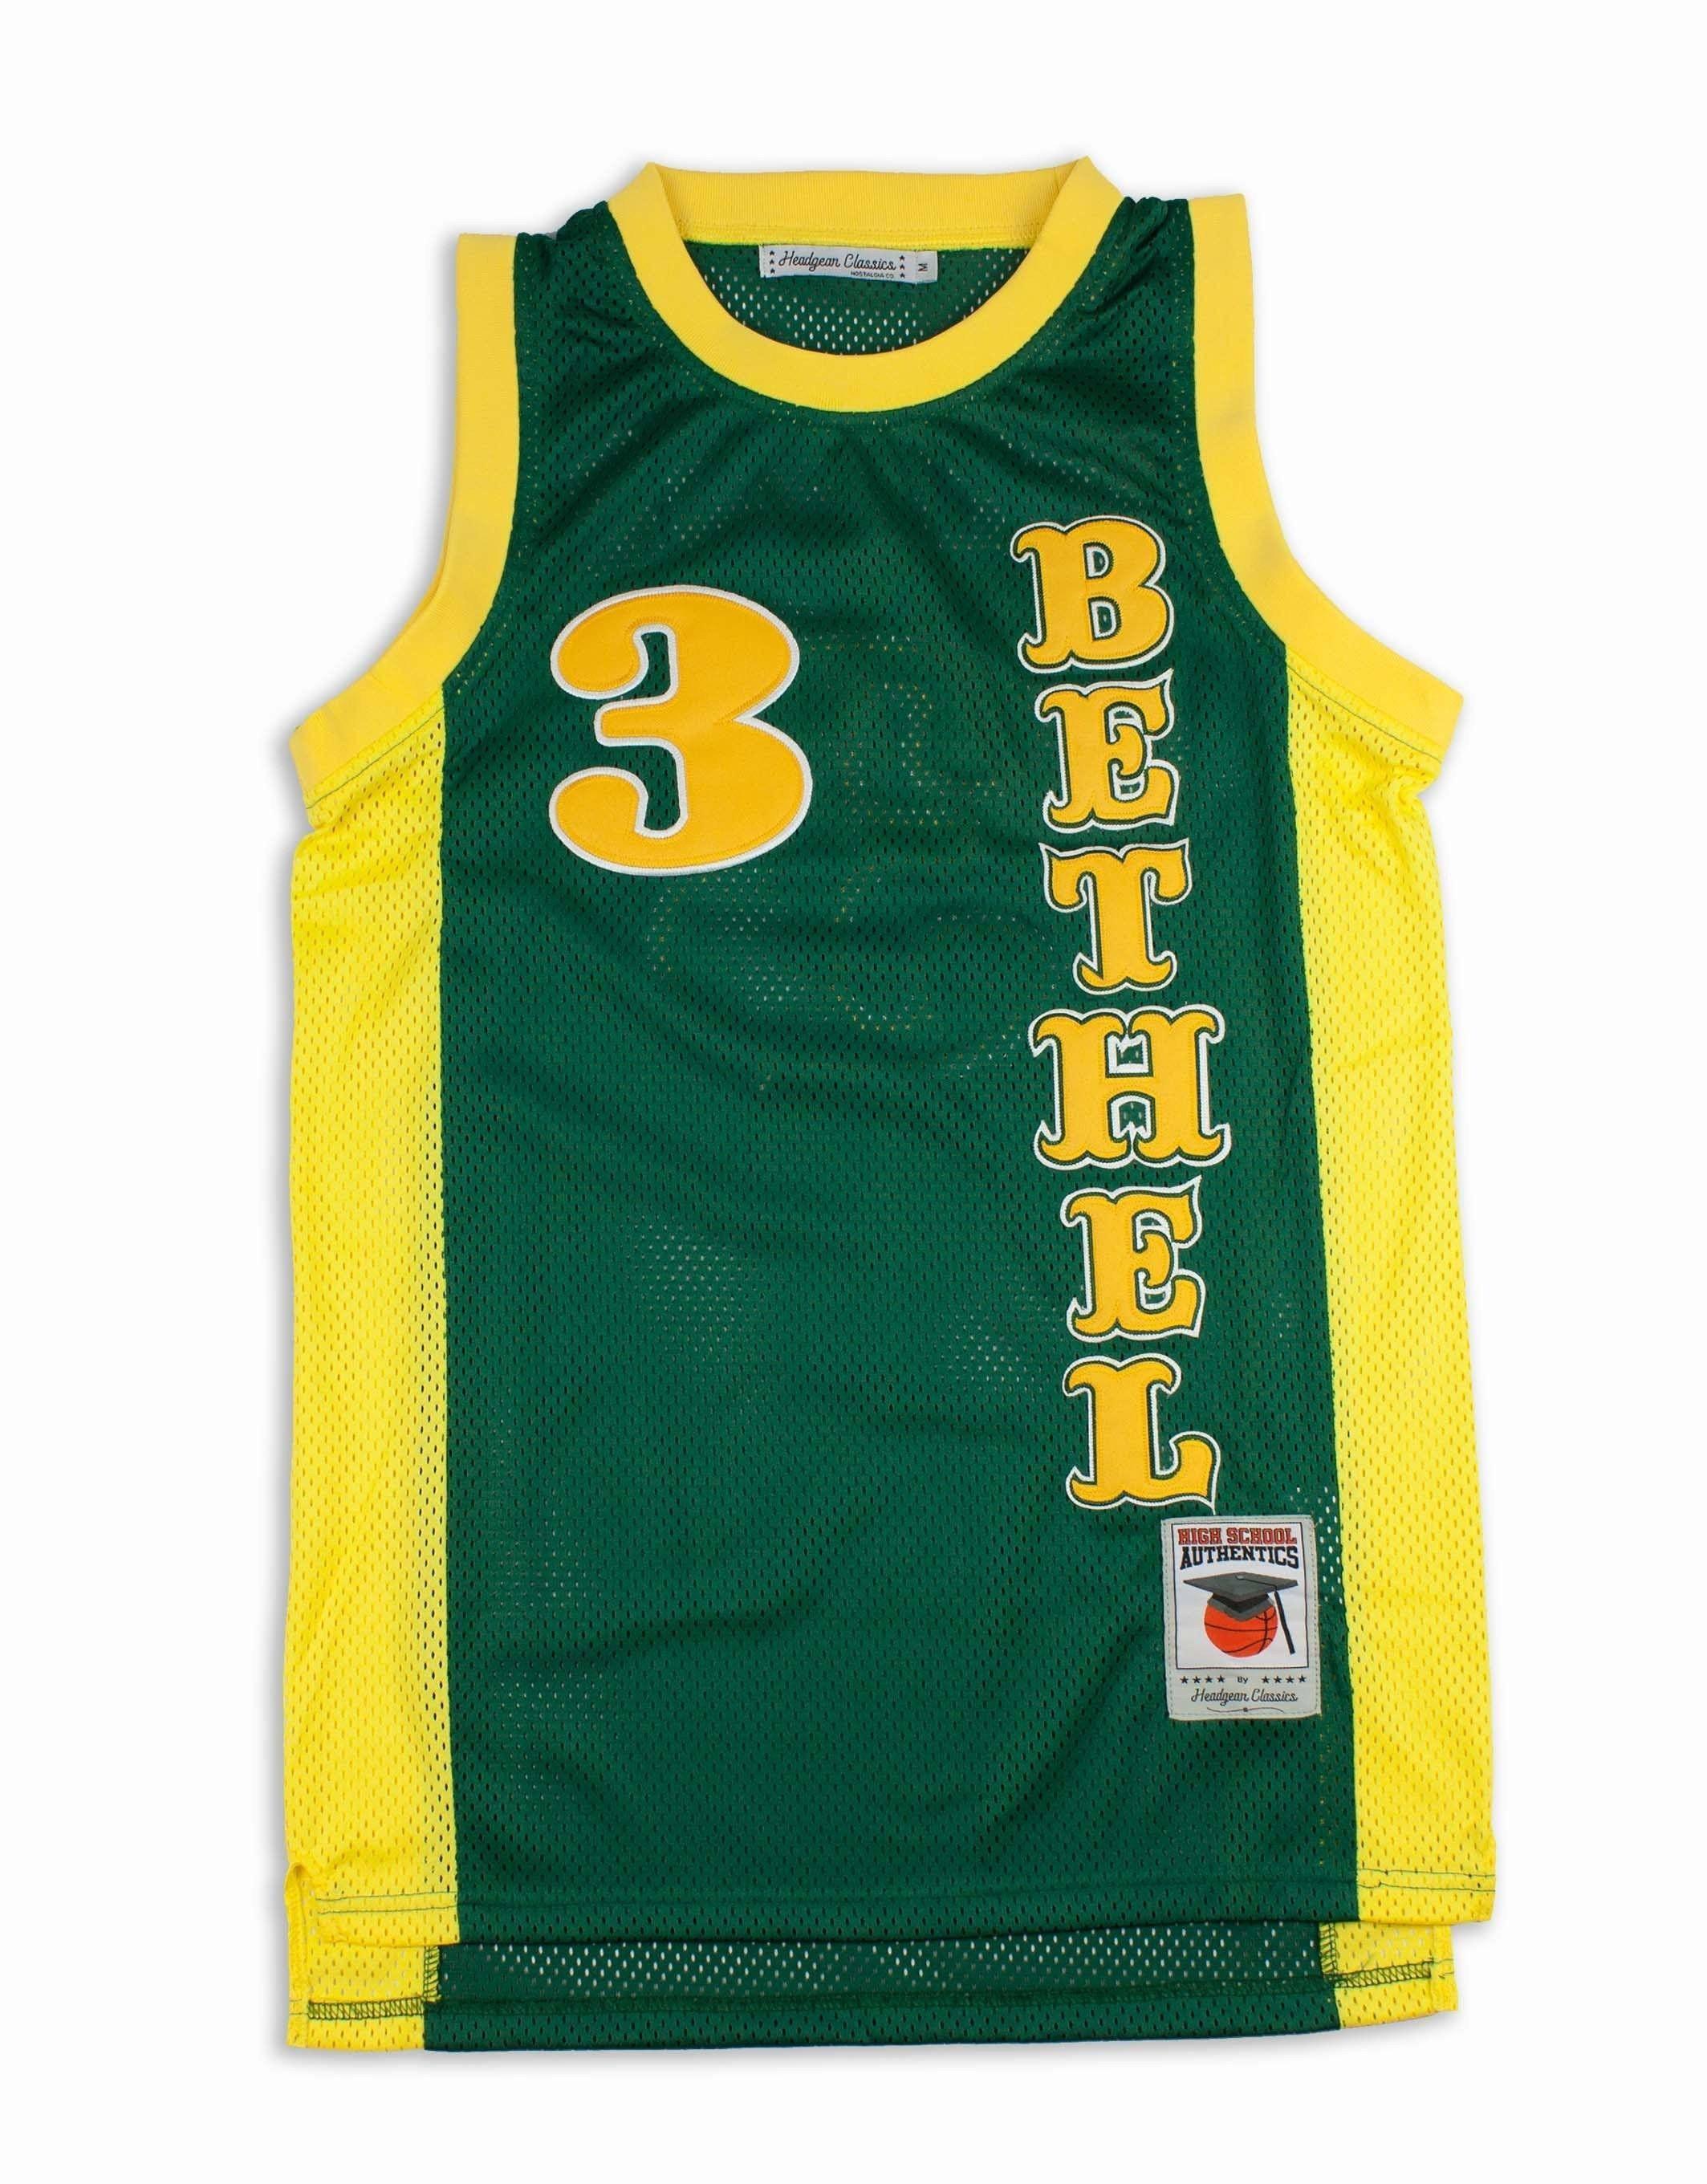 de3898a6fa6c Allen Iverson Bethel High School Retro Basketball Jersey